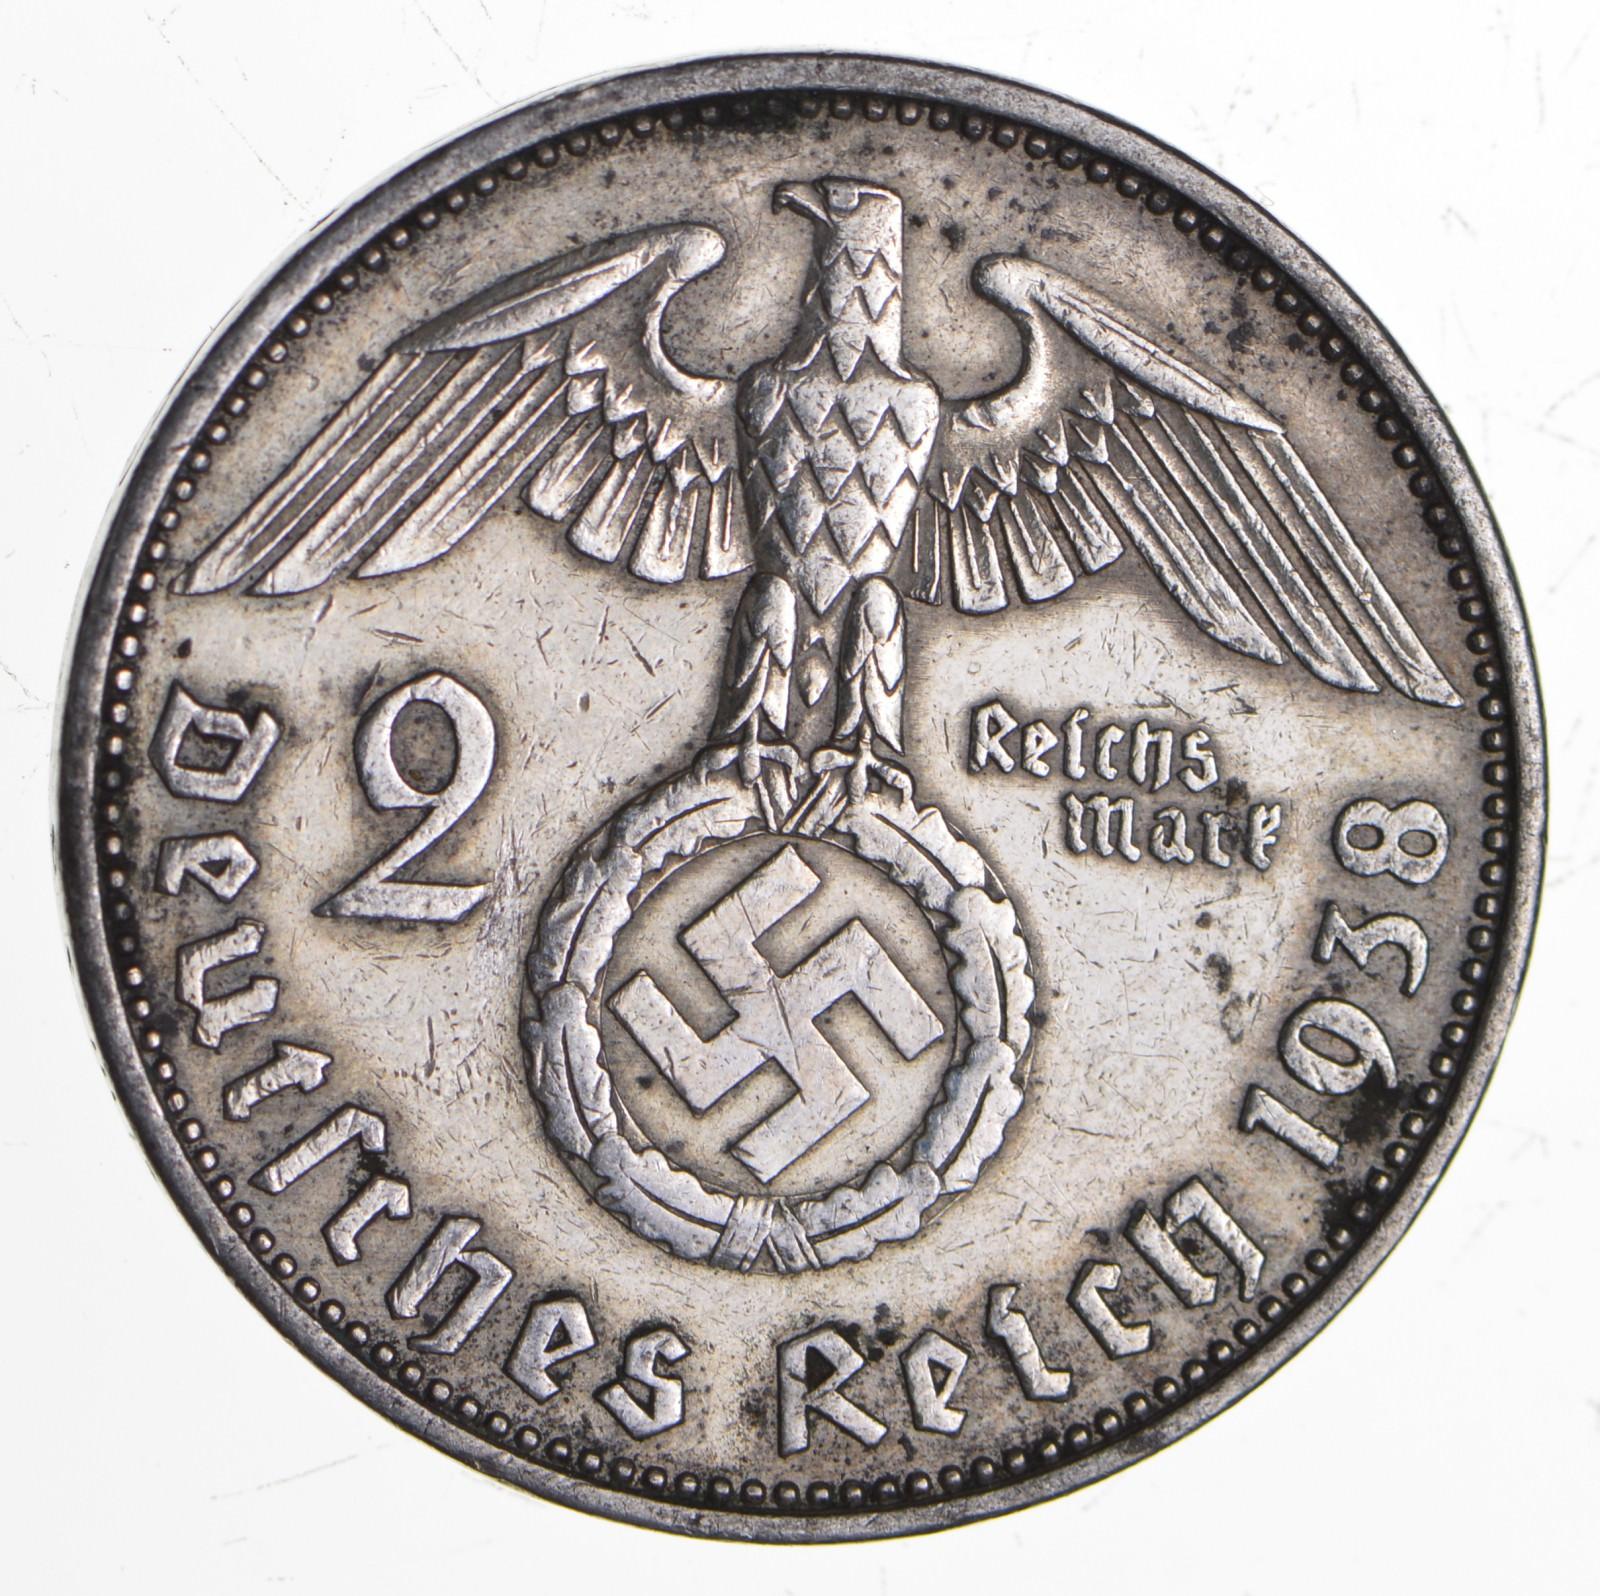 1938 german coin